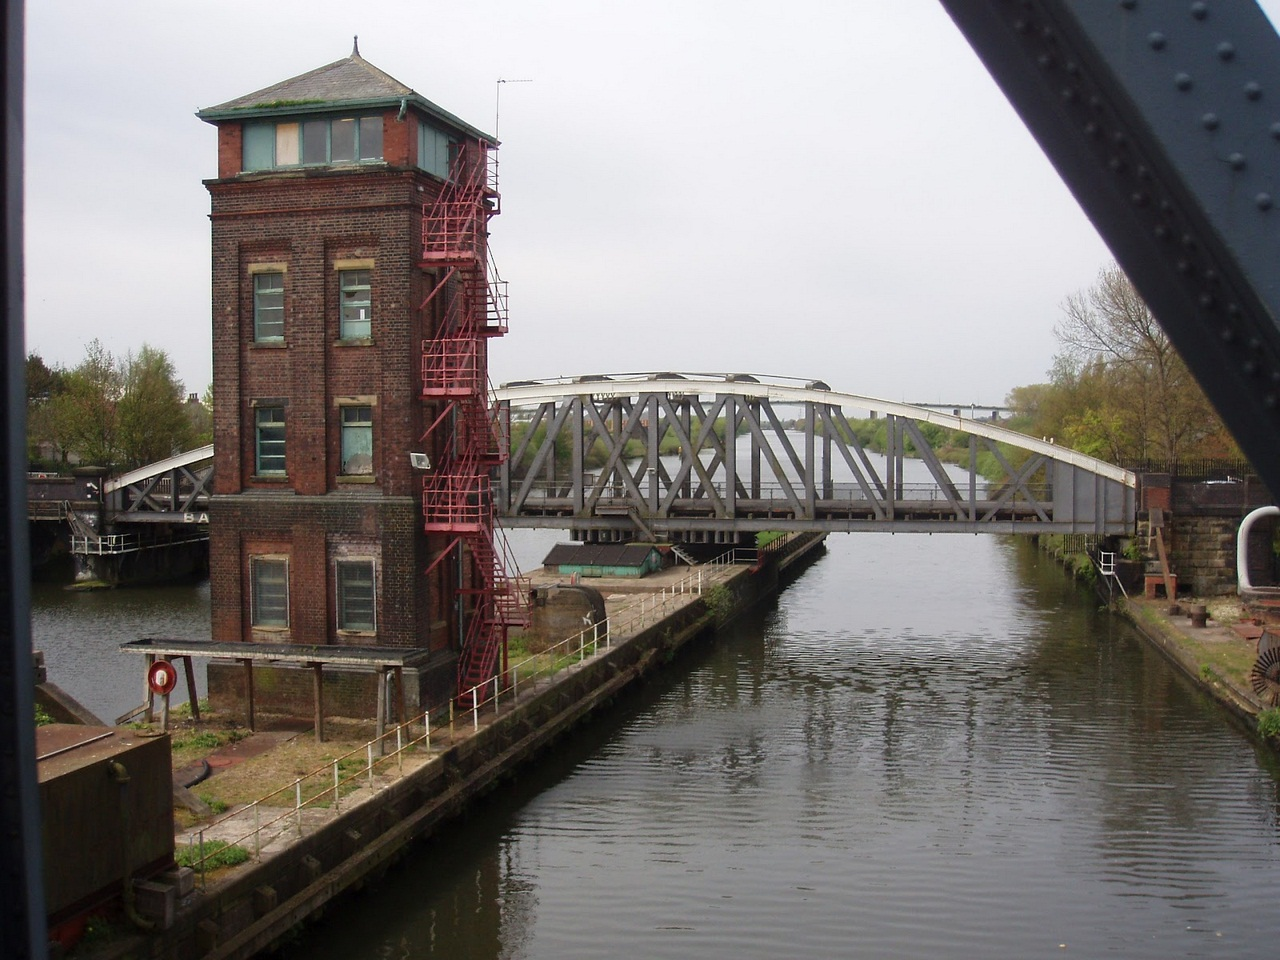 swinging-bridge-manchester-takes-off-panties-pussy-gif